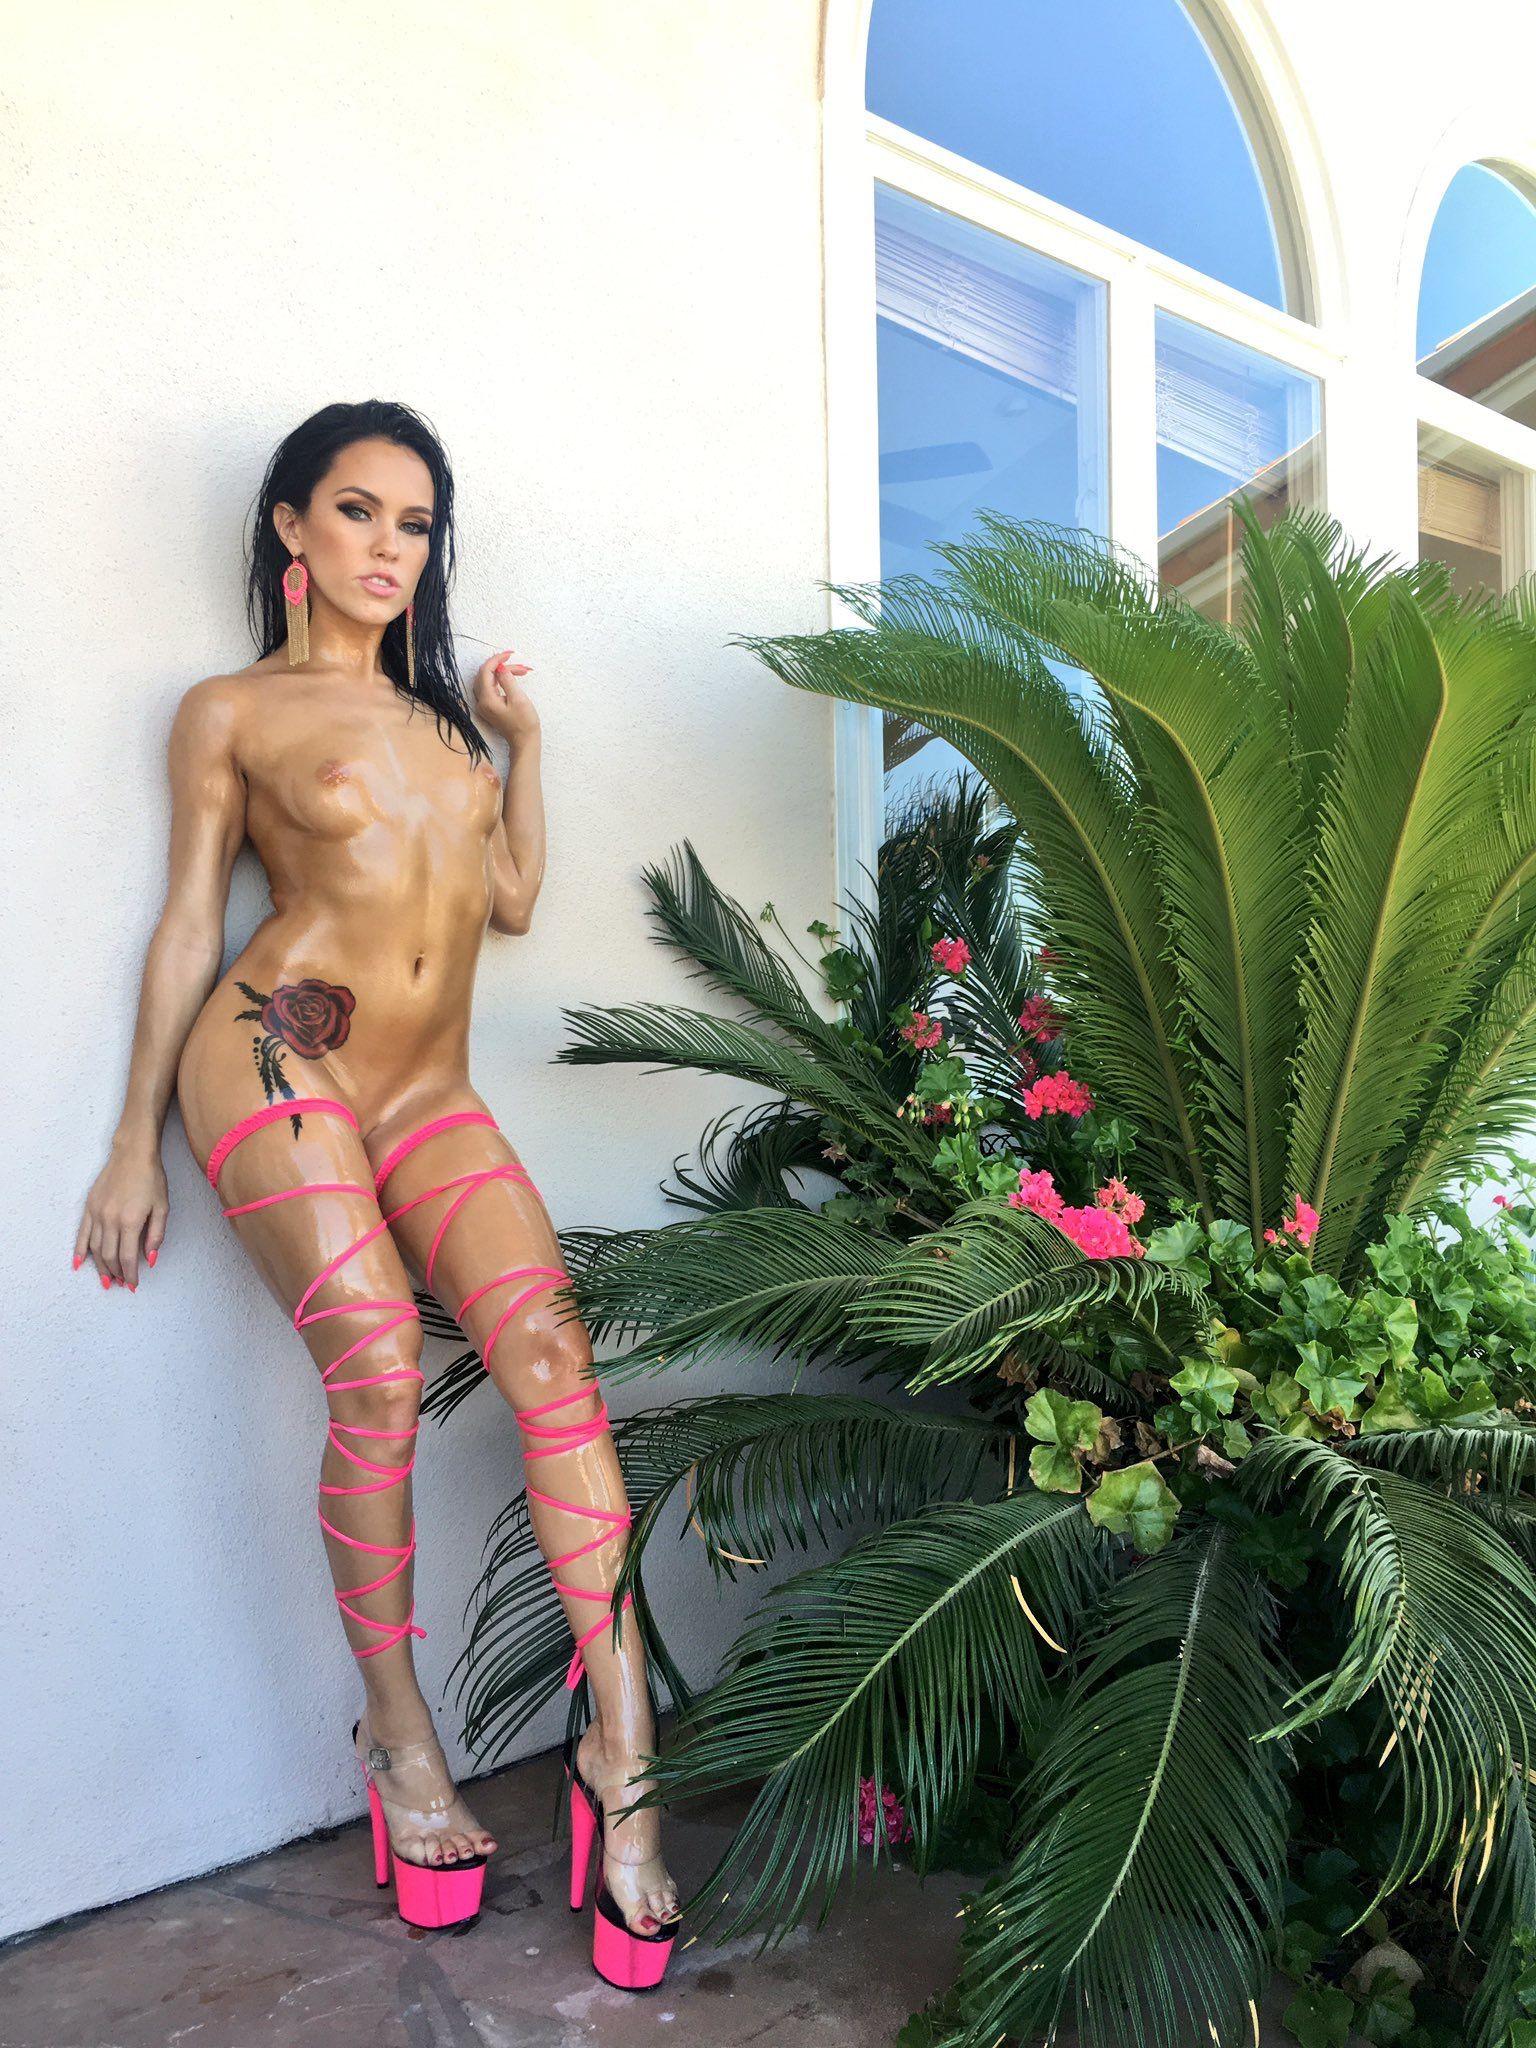 Wesley Pipes Nude Ideal megan rain   ultimate fantasy   pinterest   rain, hottest models